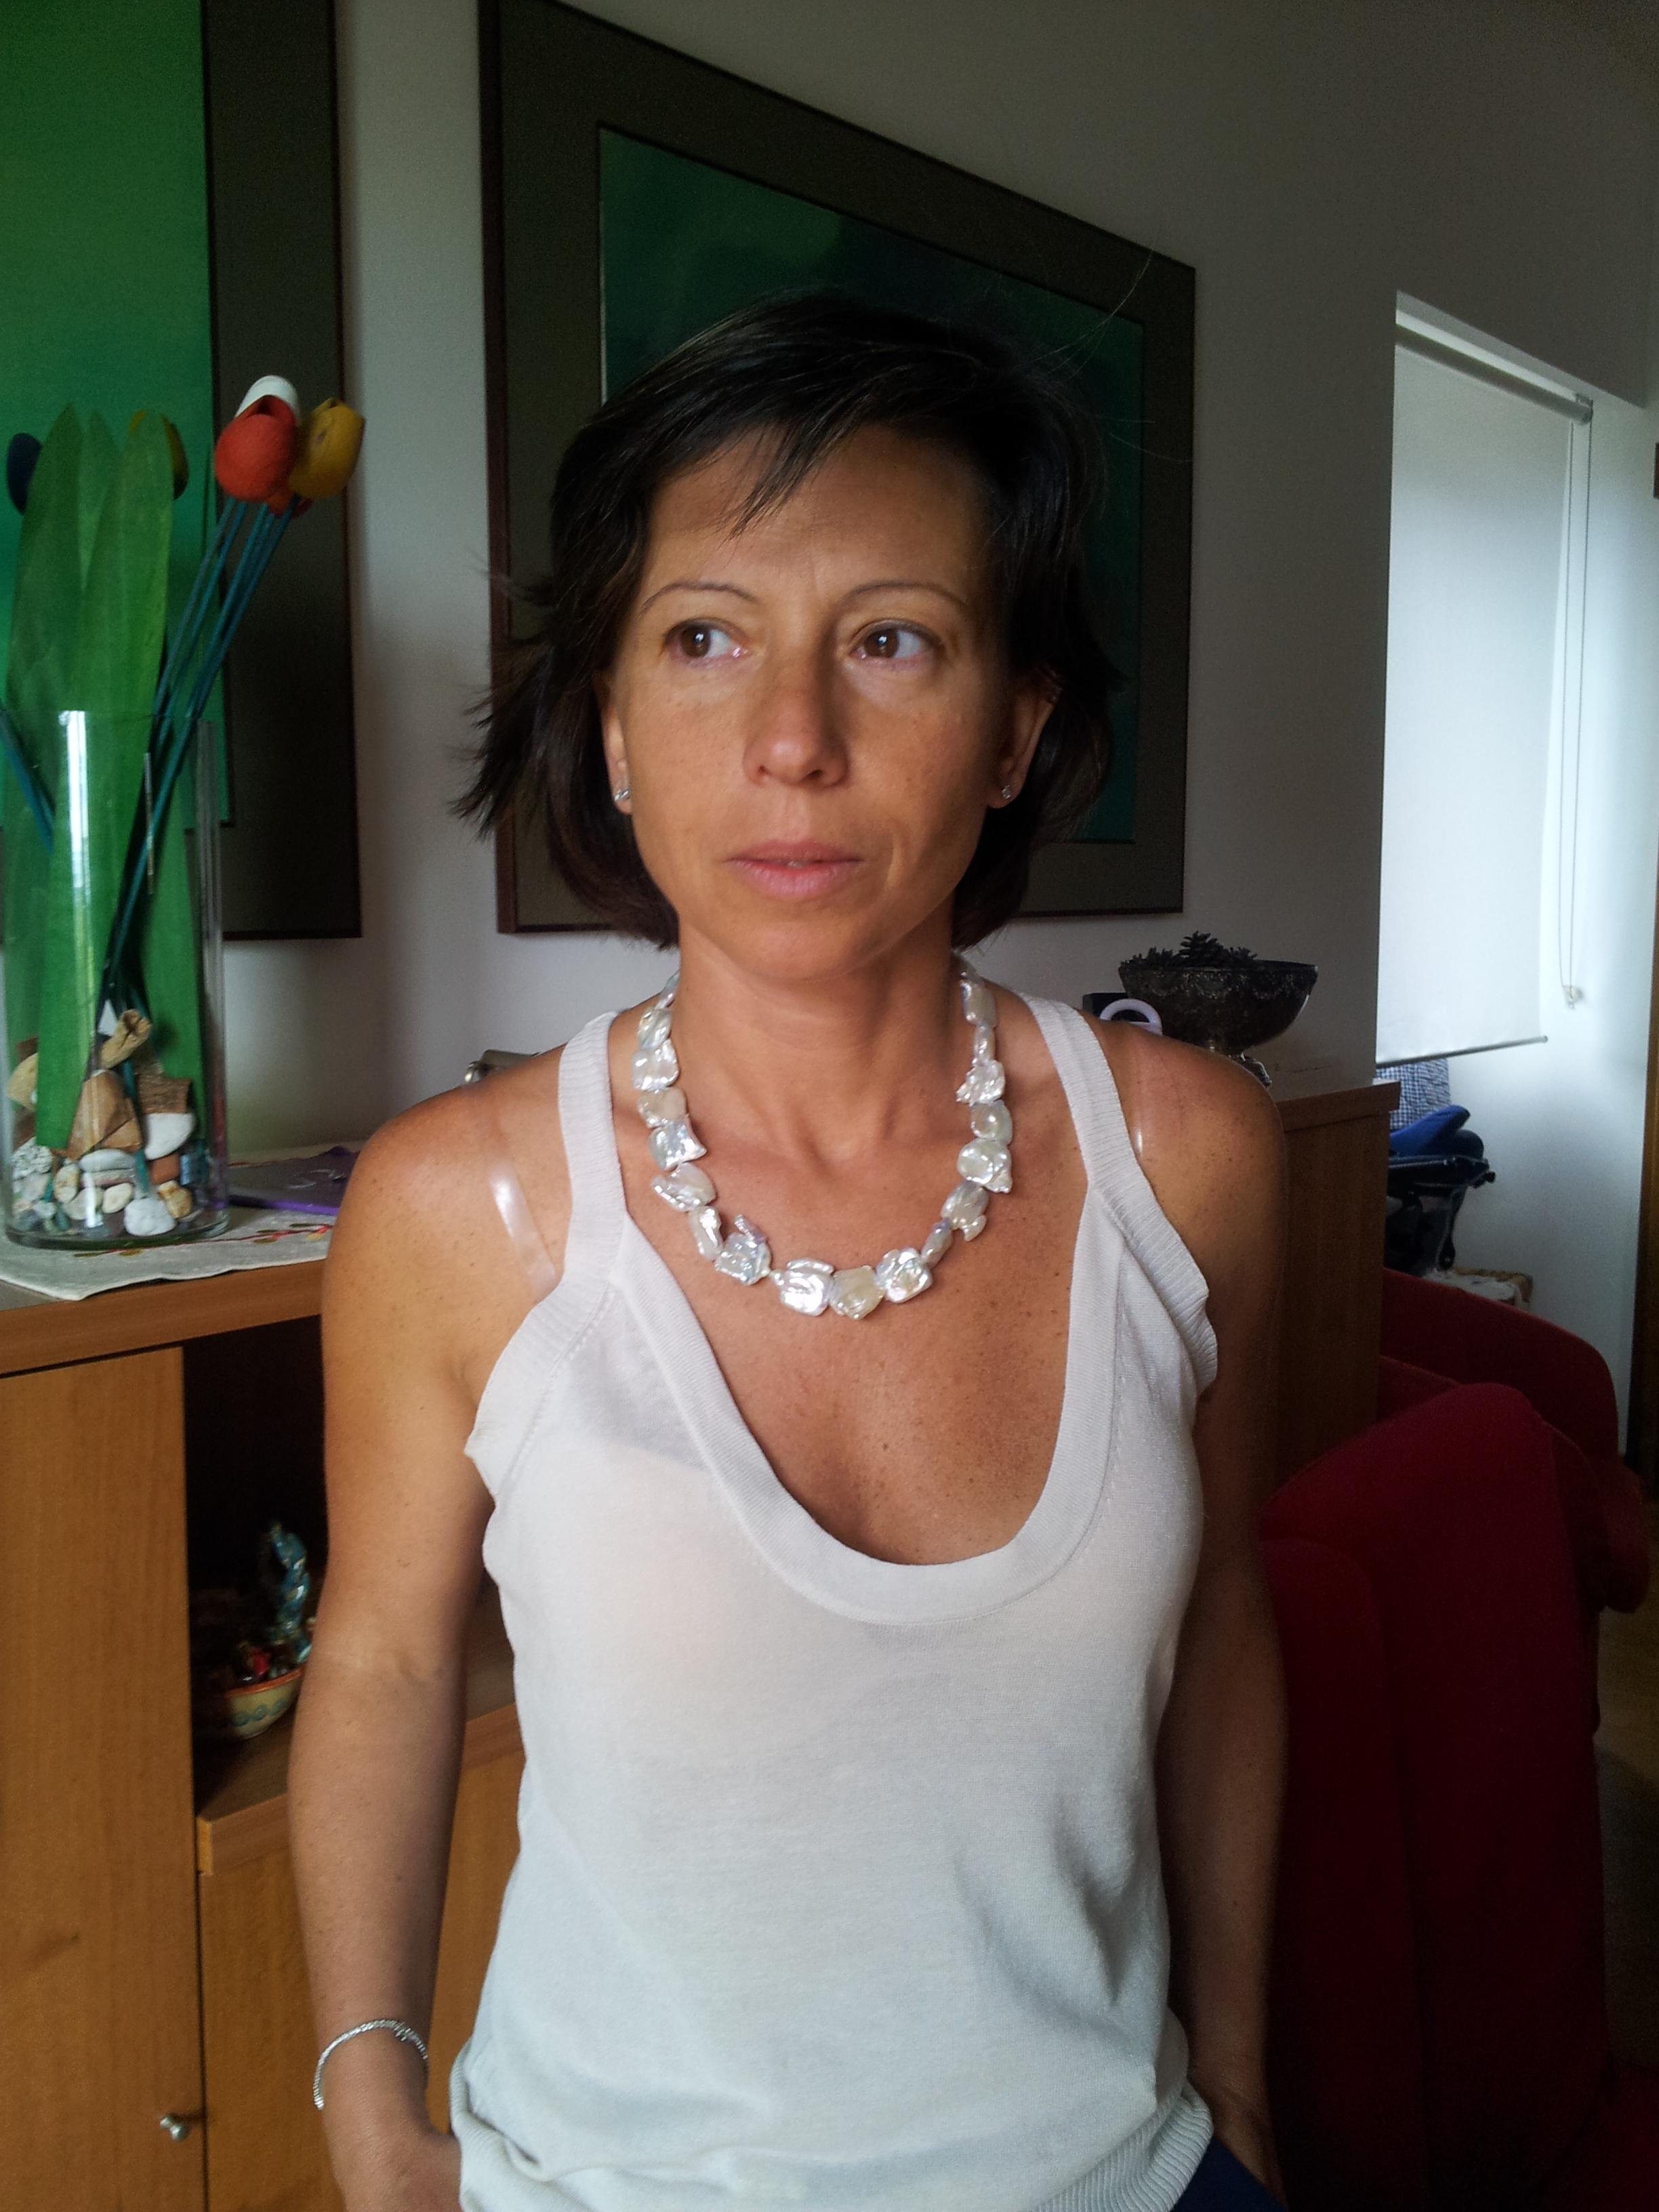 Image search: Valentina Patruno